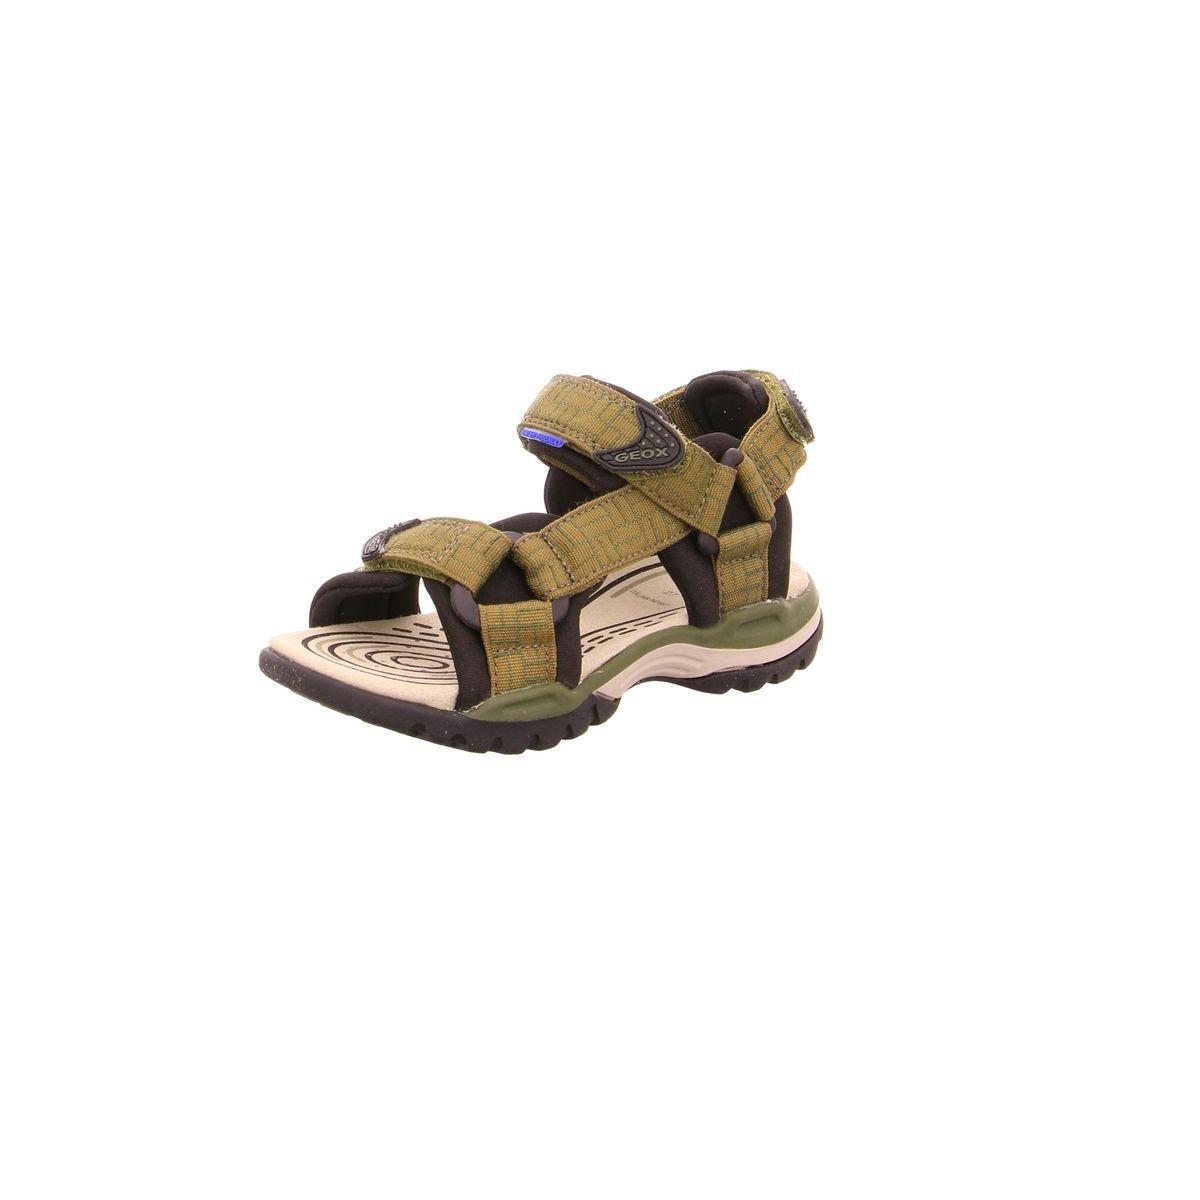 Geox Sandale | Schuhe > Sandalen & Zehentrenner > Sandalen | Geox